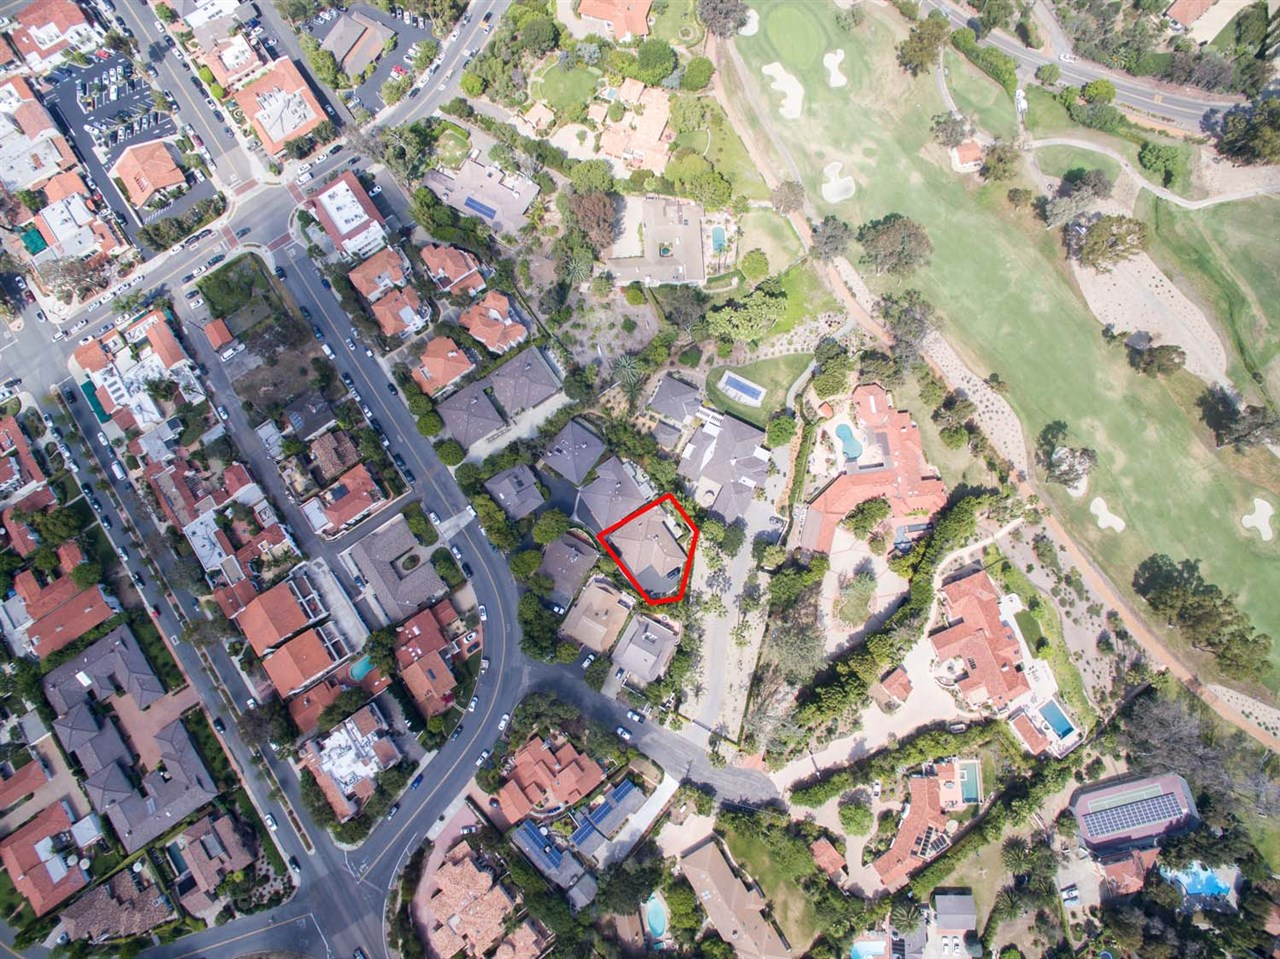 6148 El Tordo, Rancho Santa Fe, CA 92067